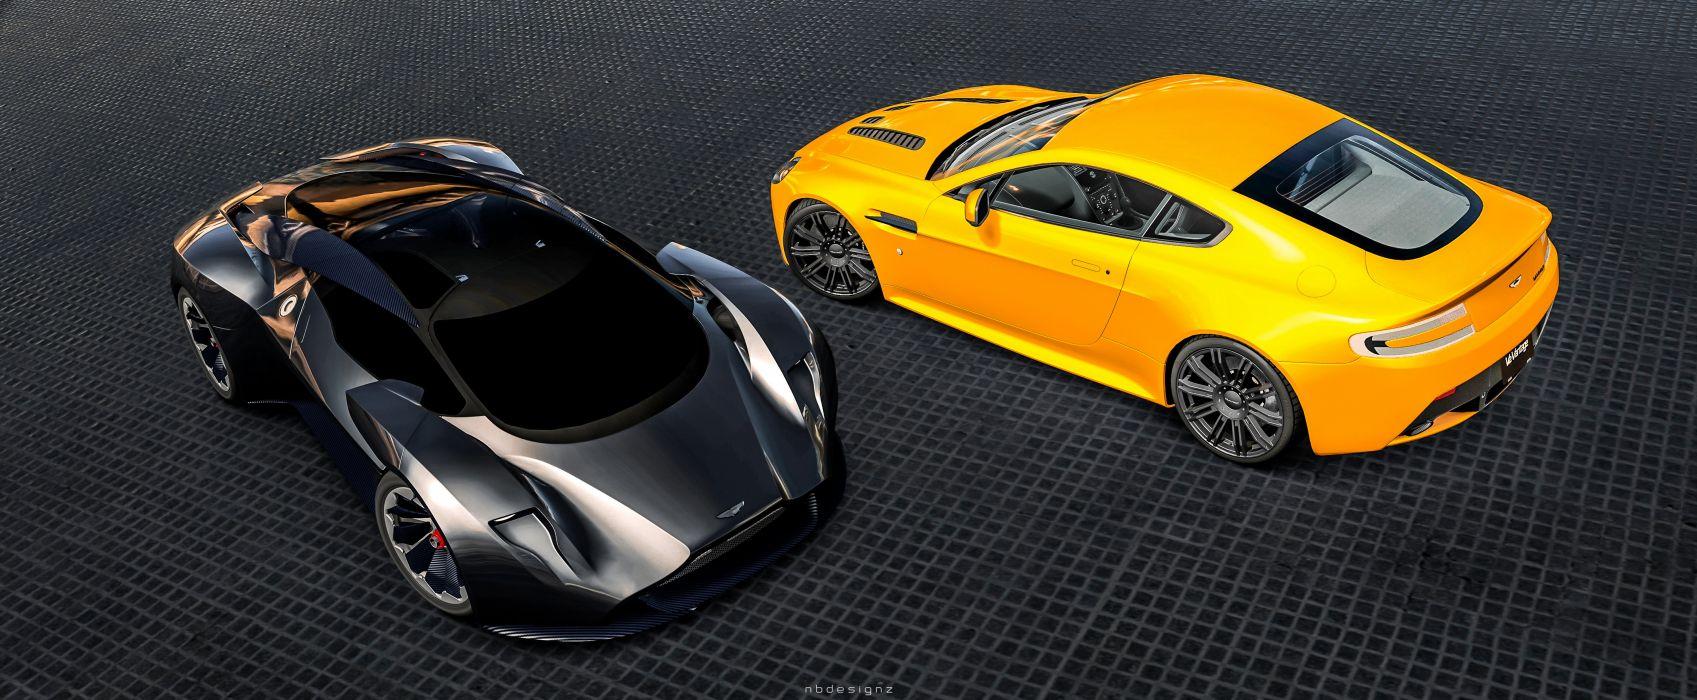 Aston Martin V12 Vantage & DP-100 Gran Turismo 6 NBDESIGNZVision GT wallpaper